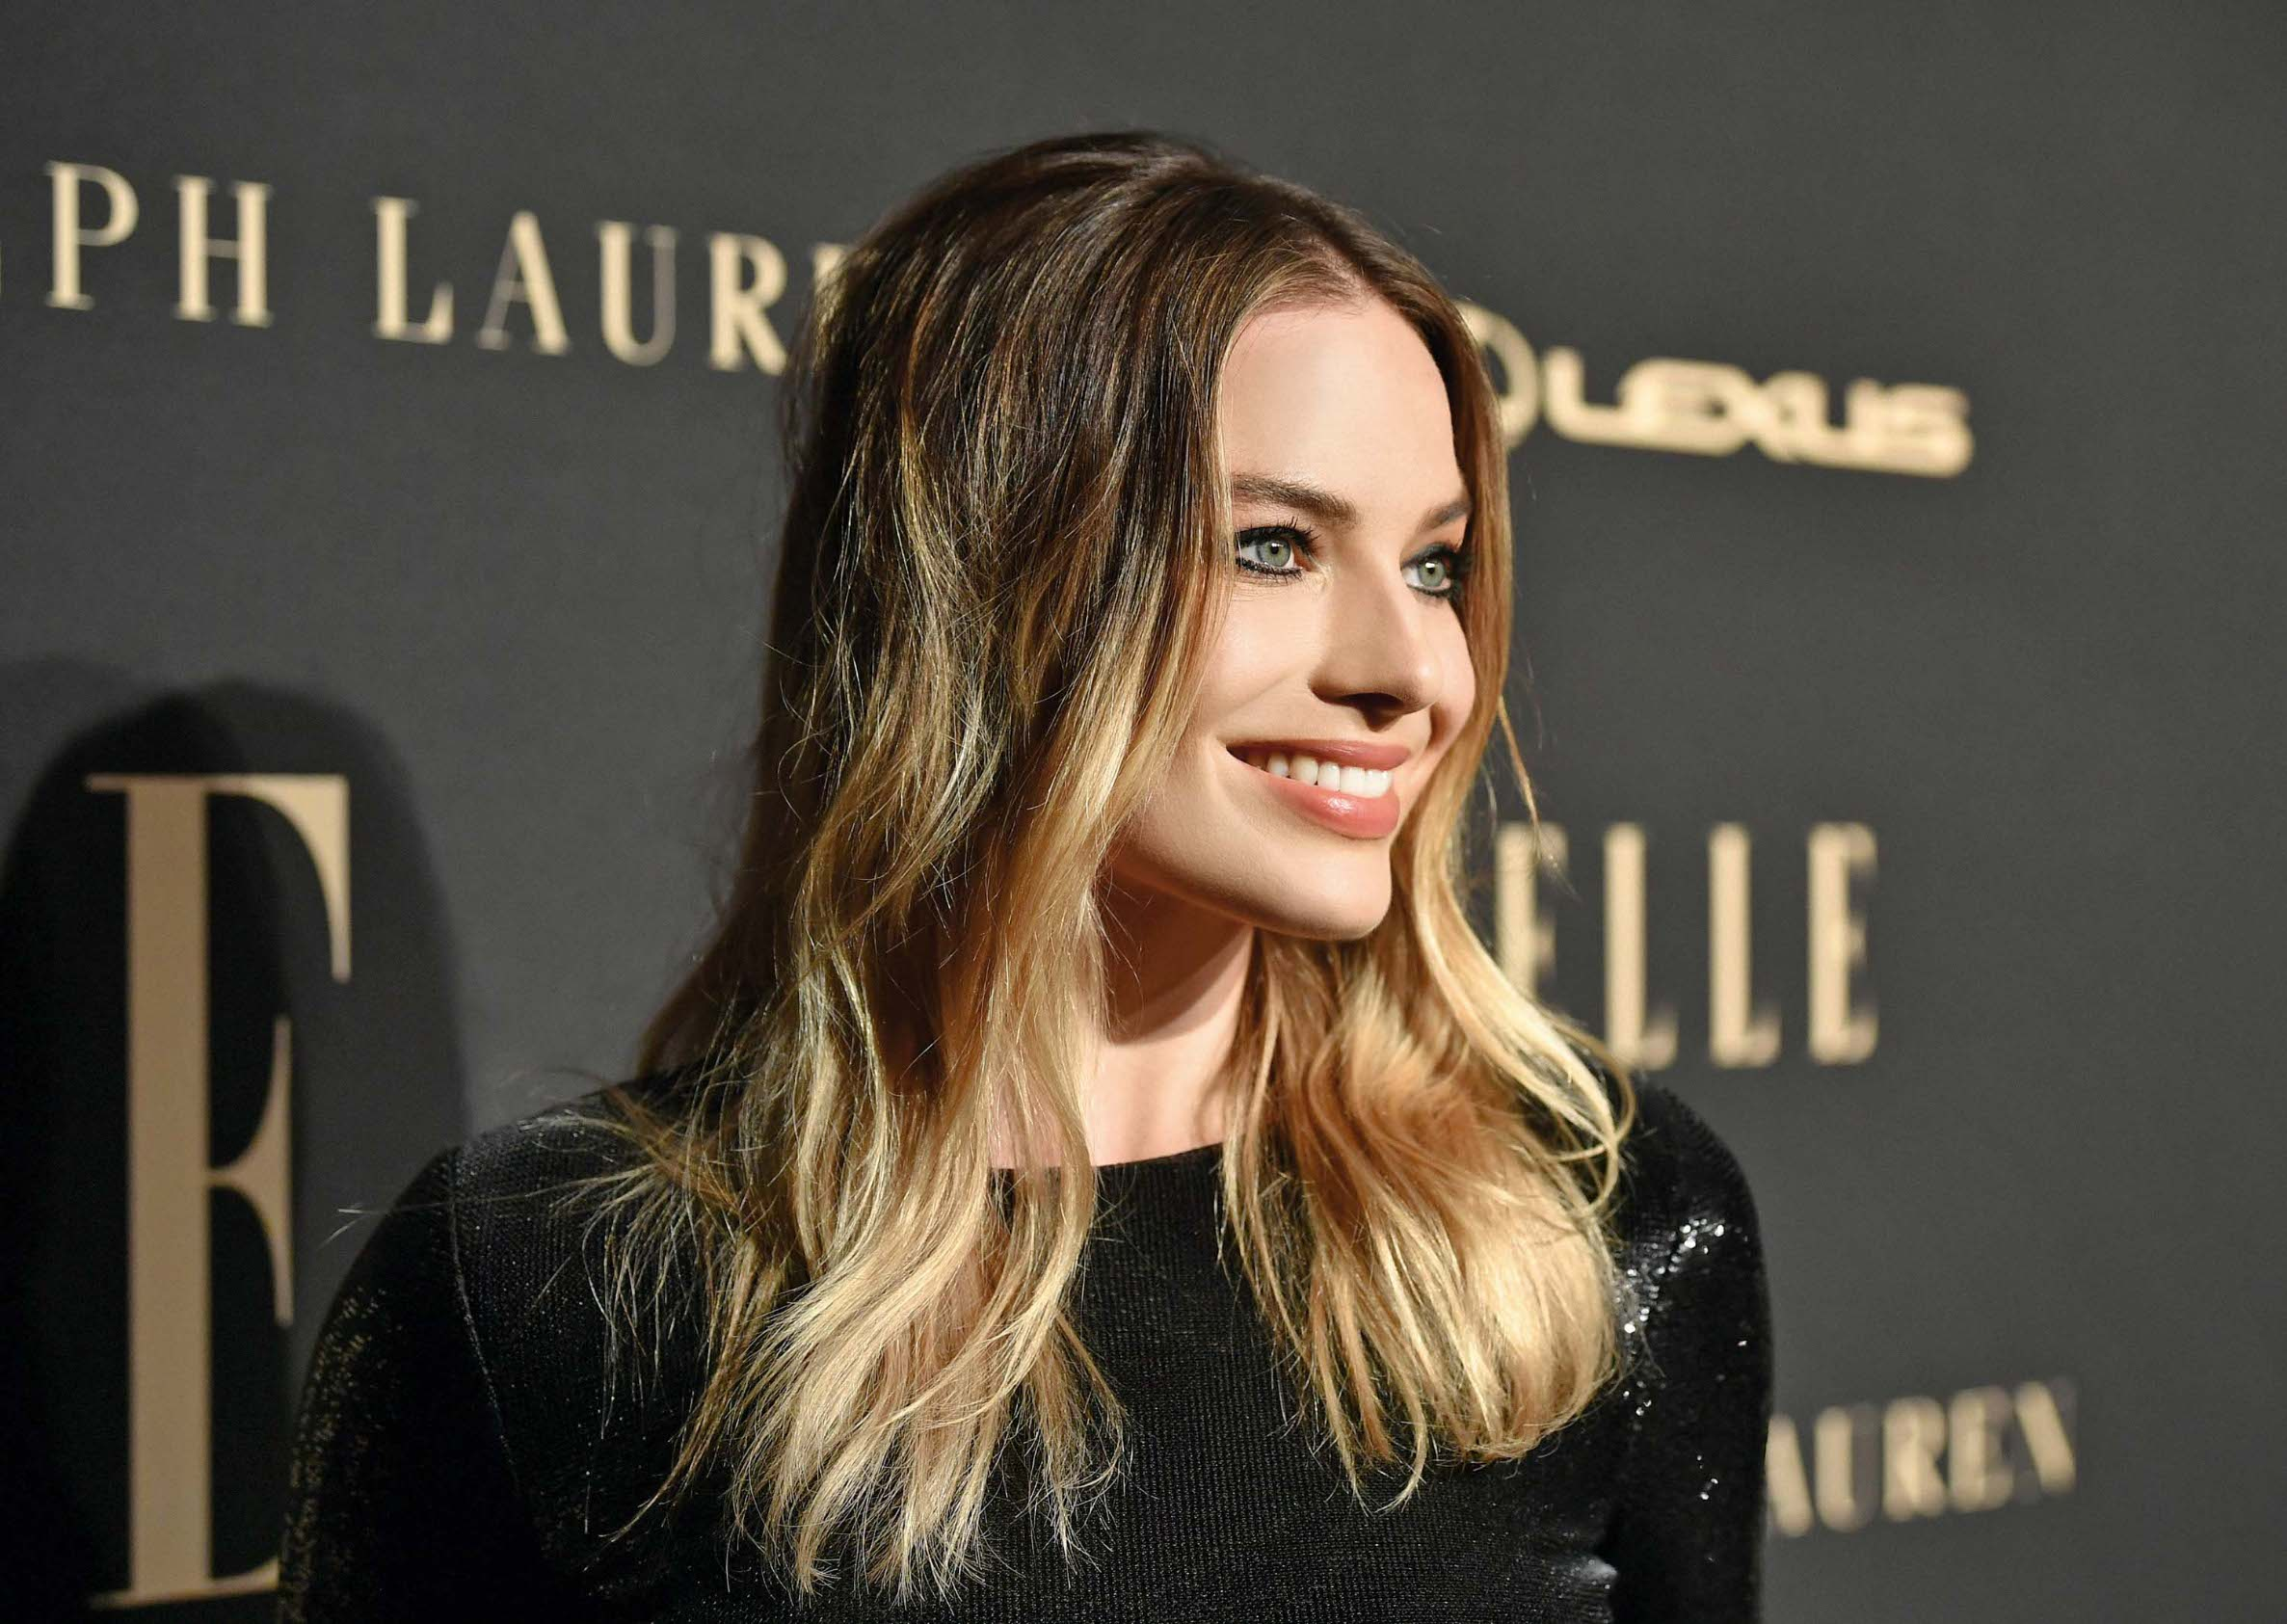 Holivudska miljenica Margot Robbie preferira nonšalantne frizure